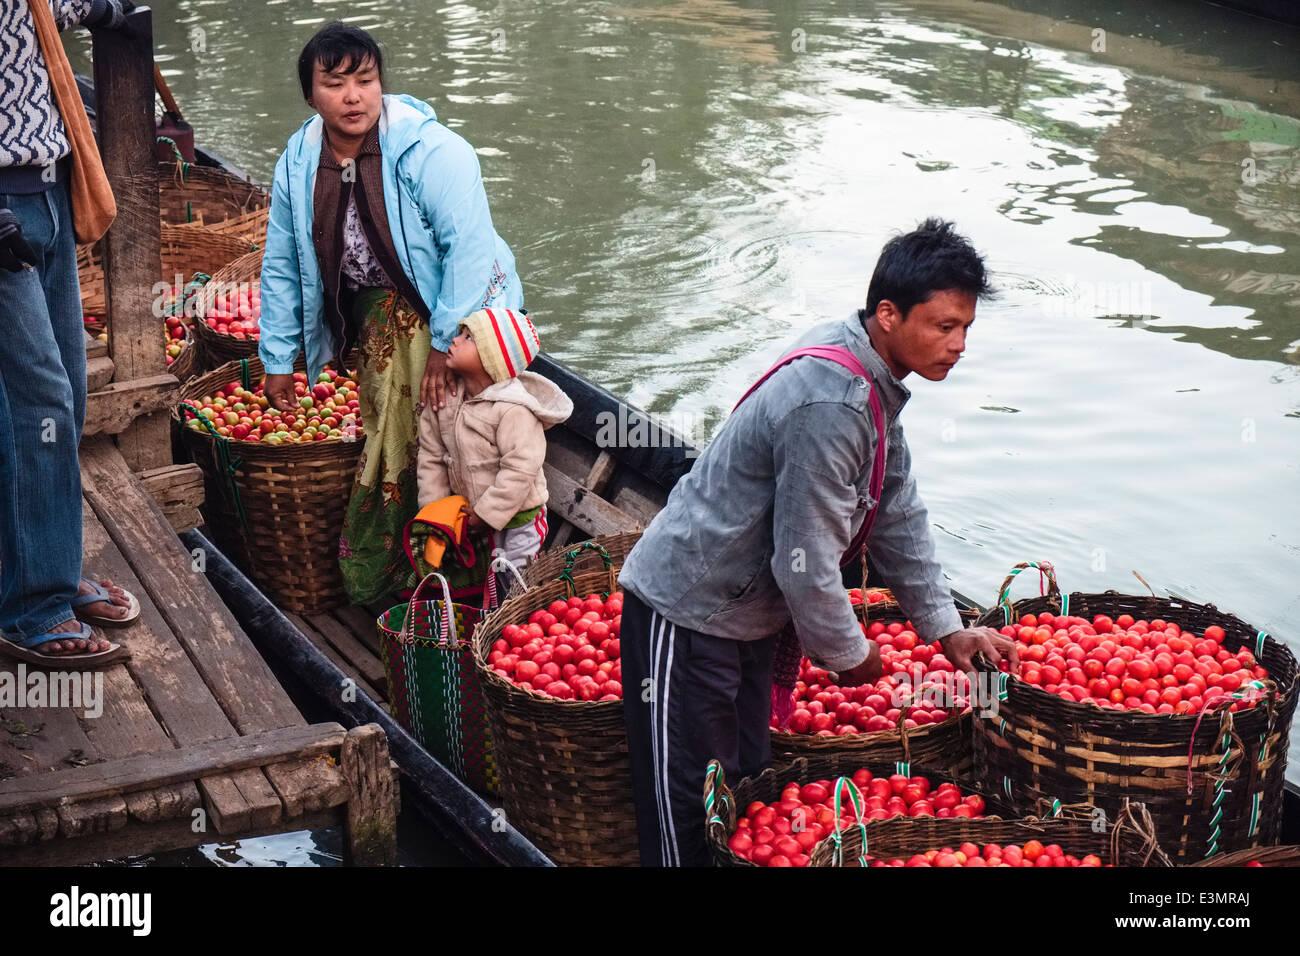 Farmers unload tomatoes, Nyaung Shwe, Inle Lake, Myanmar, Asia - Stock Image